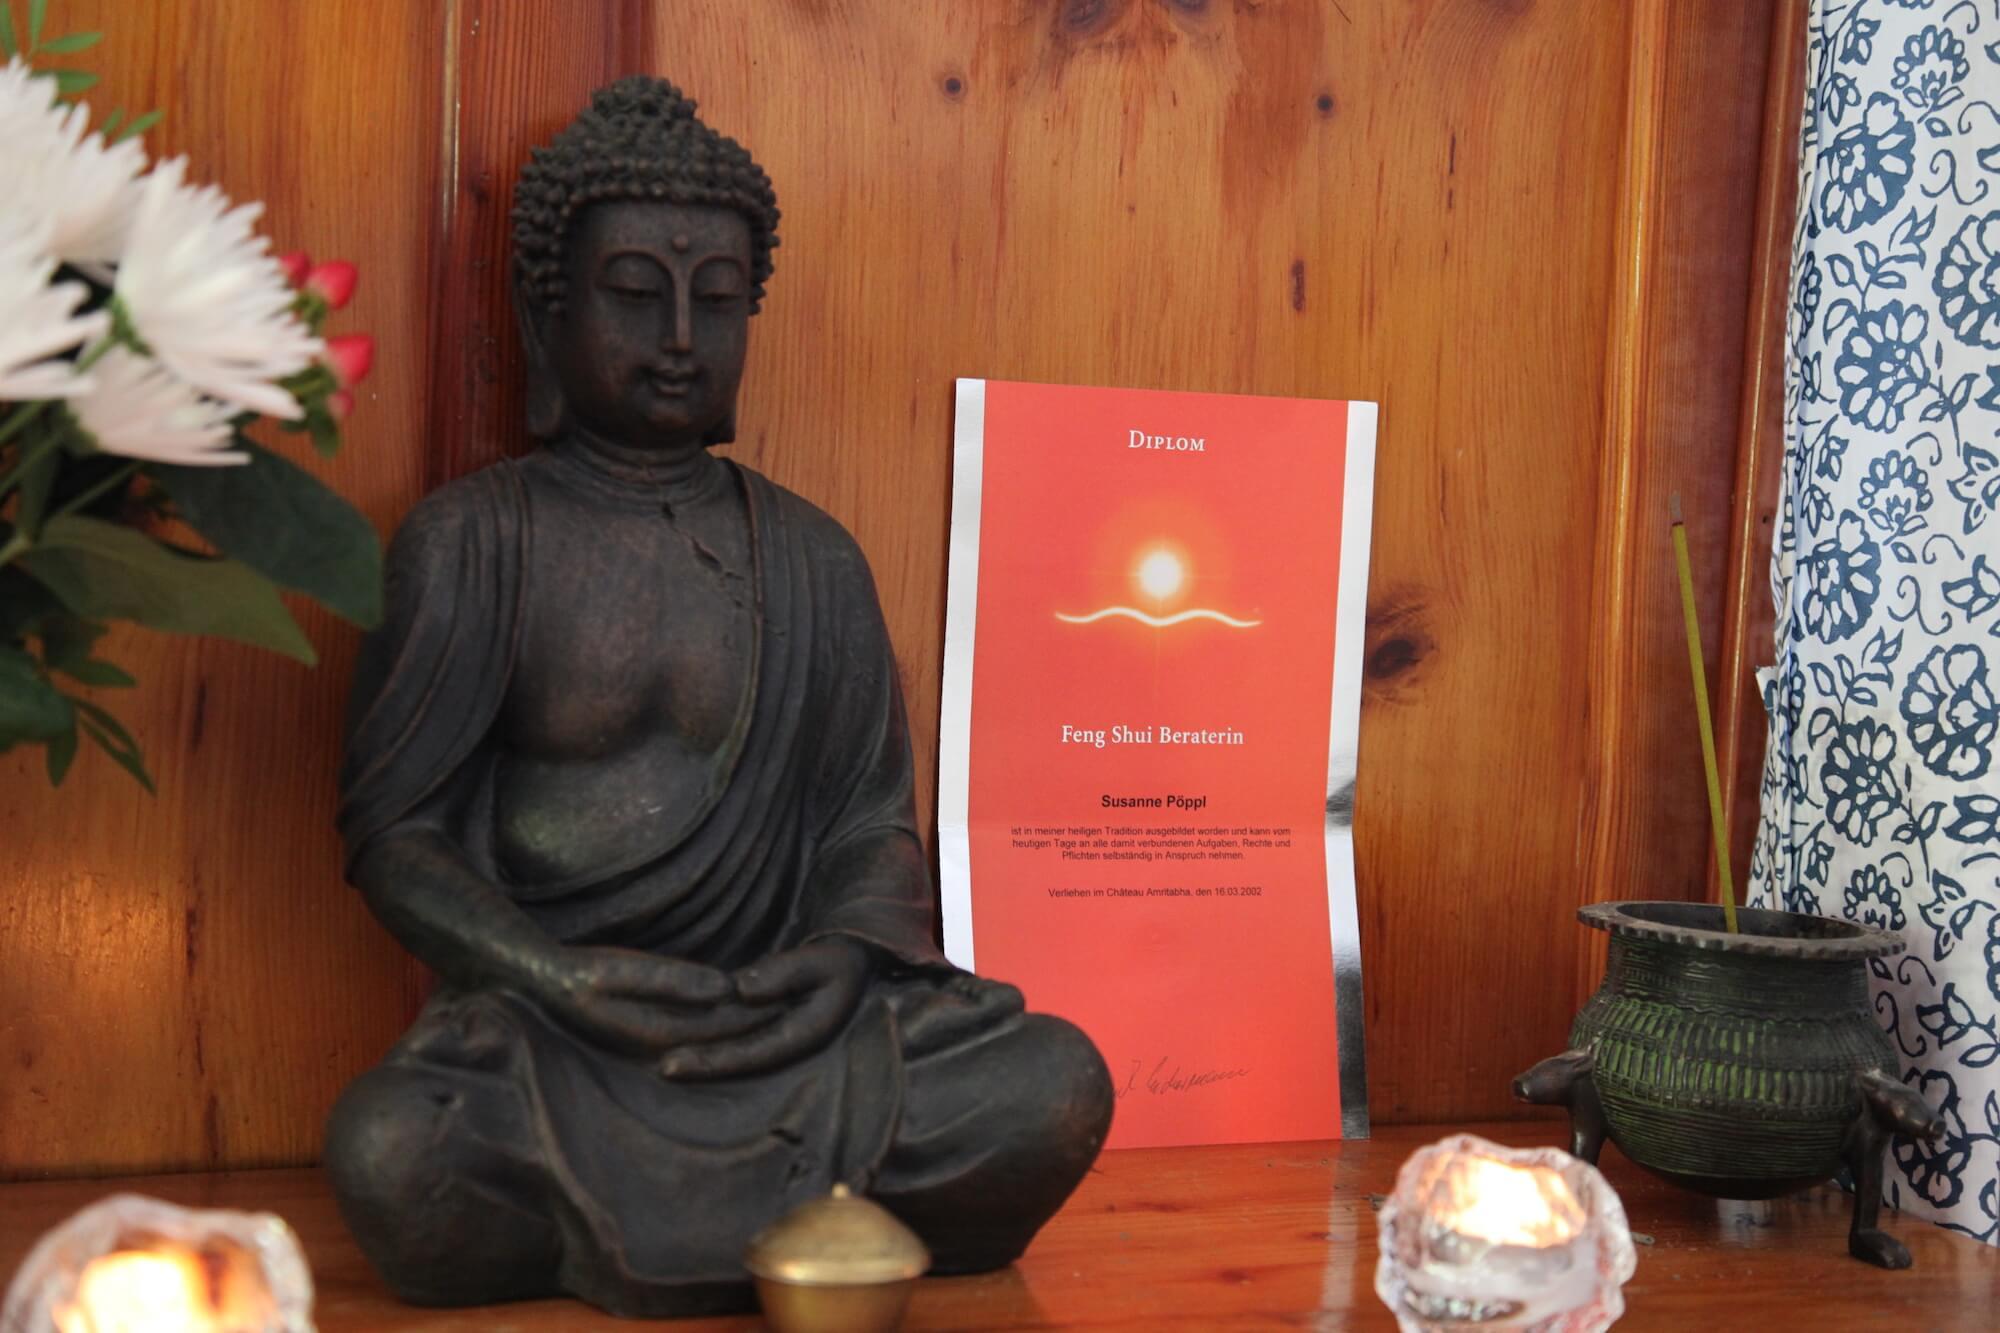 Naturschamane_Feng_Shui_Samanische_Seminare_Spirituelles_Coaching_Essenzen_Meditationen_Vasnaro_14.jpg